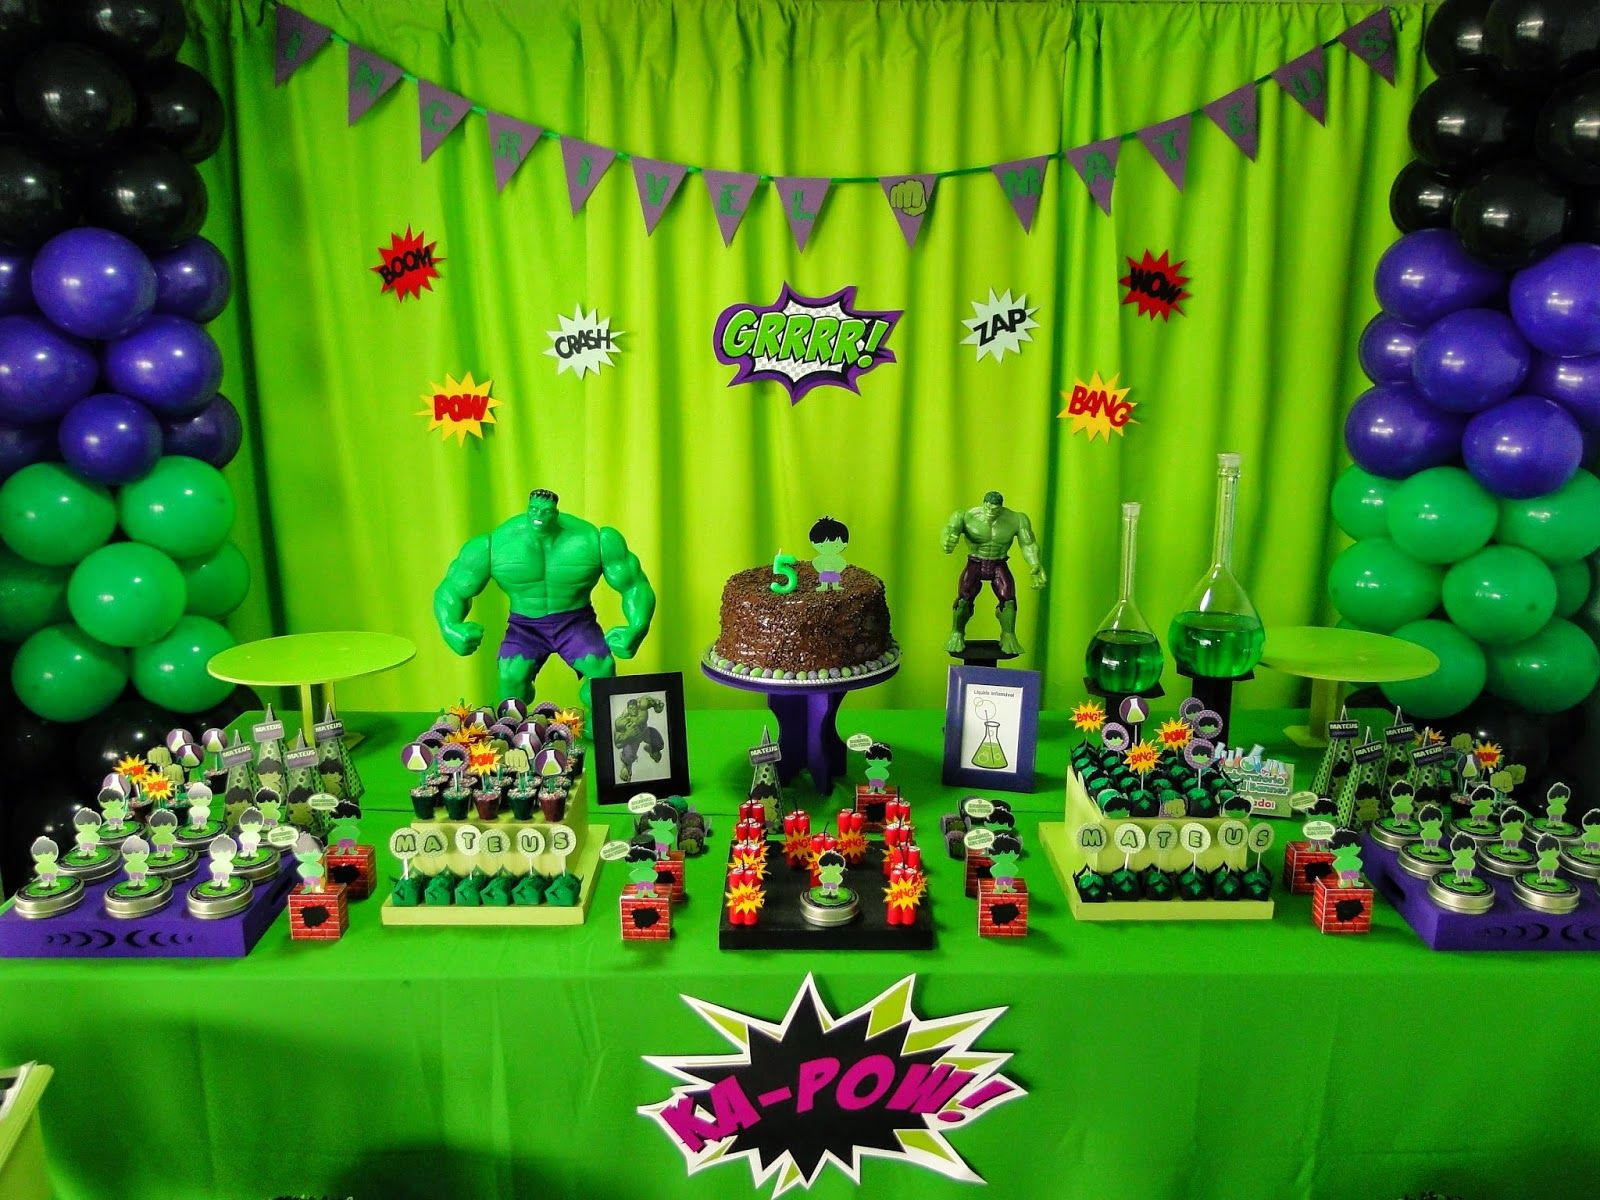 Incrivel Hulck Top o incrível hulk para o mateus !   incrível hulk, hulk e festejar